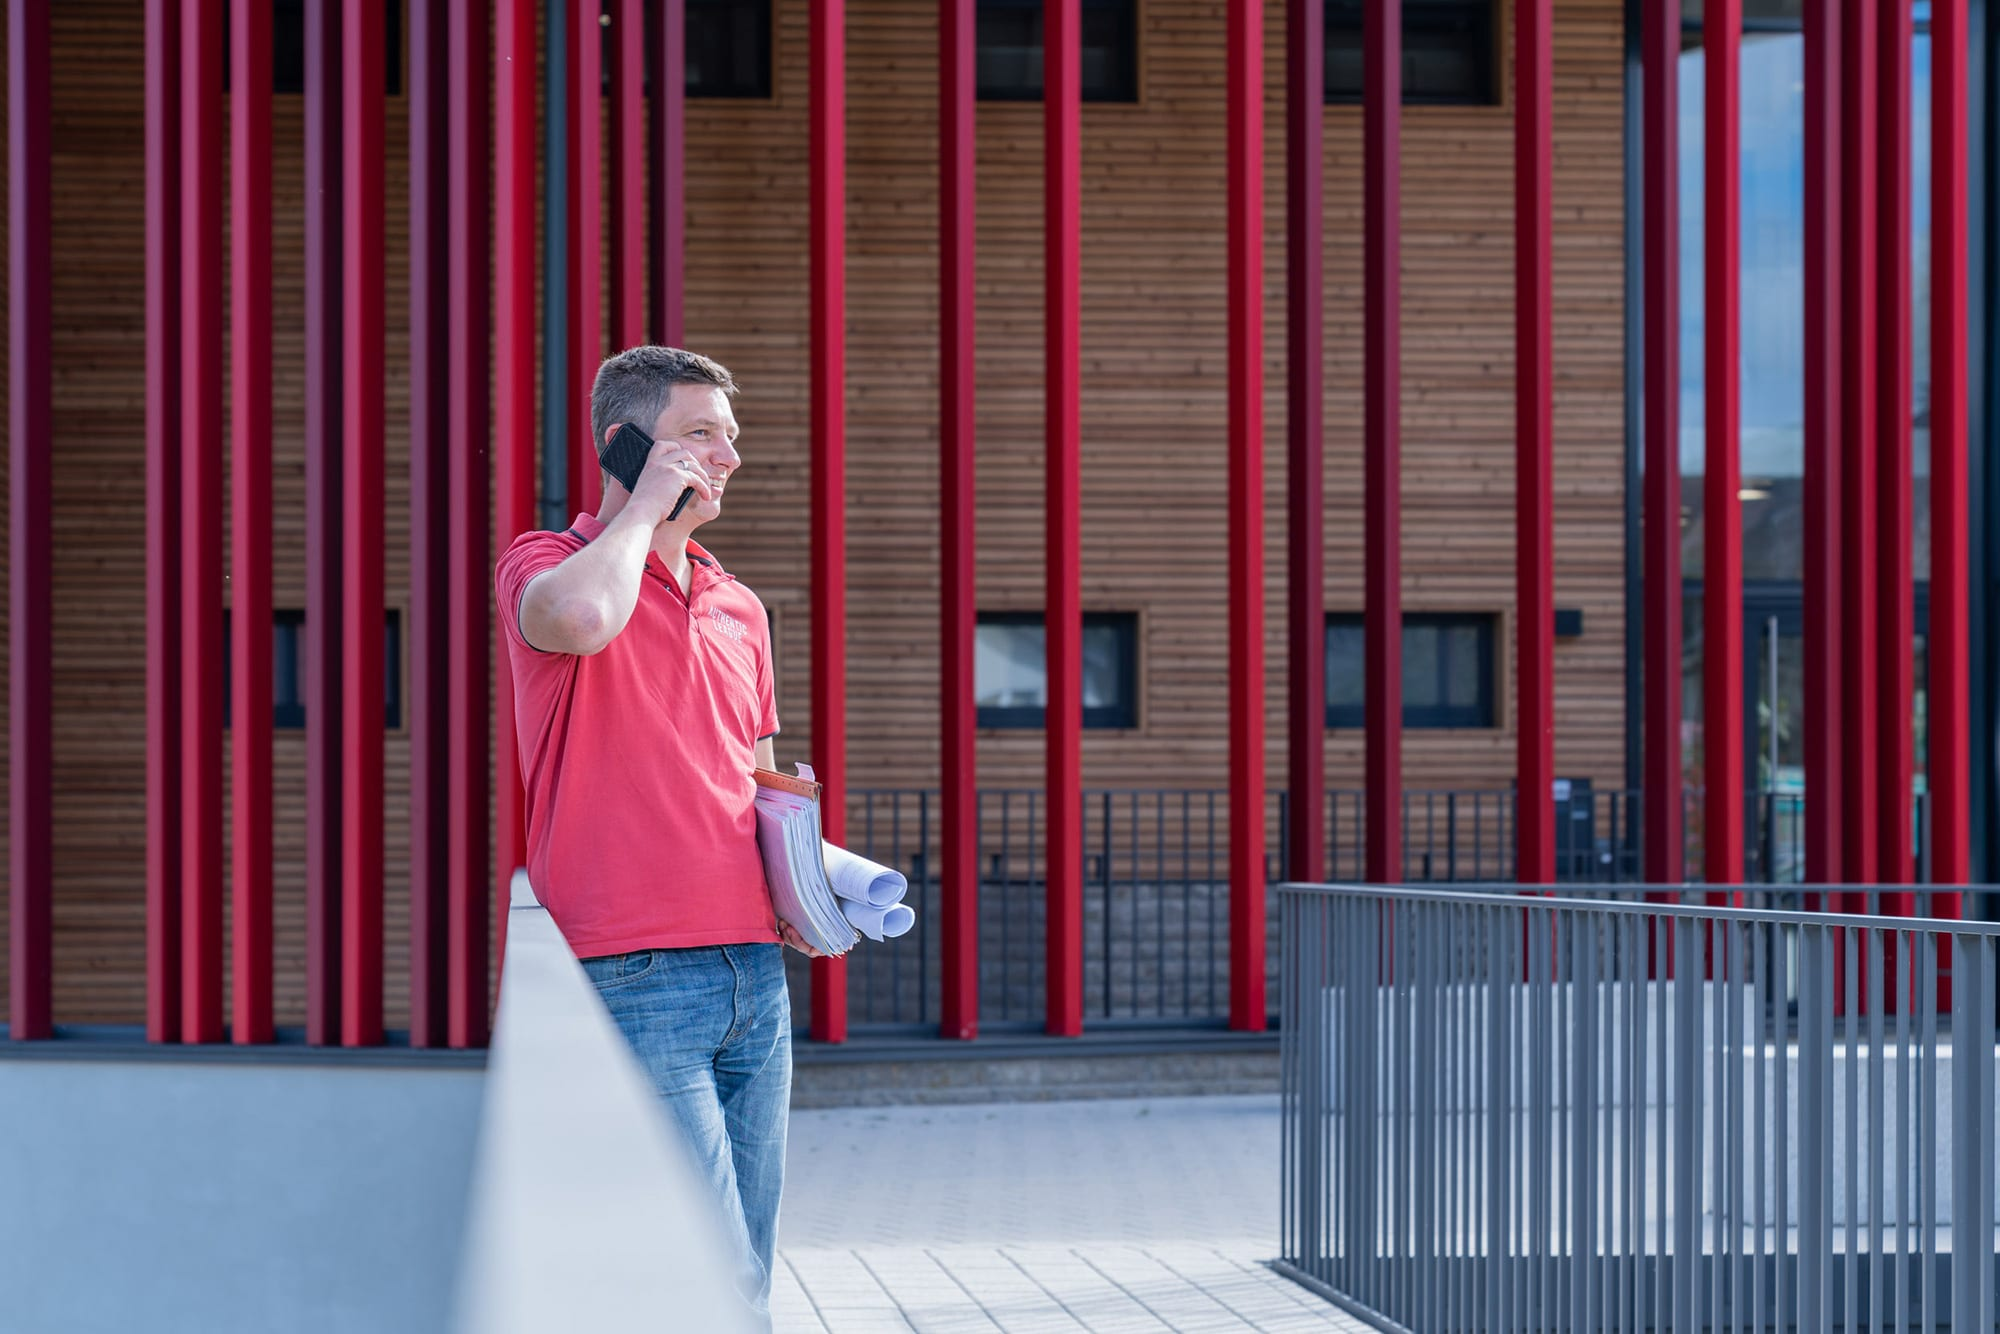 Ingenieurbuero Schlachter - Kontaktfreudig